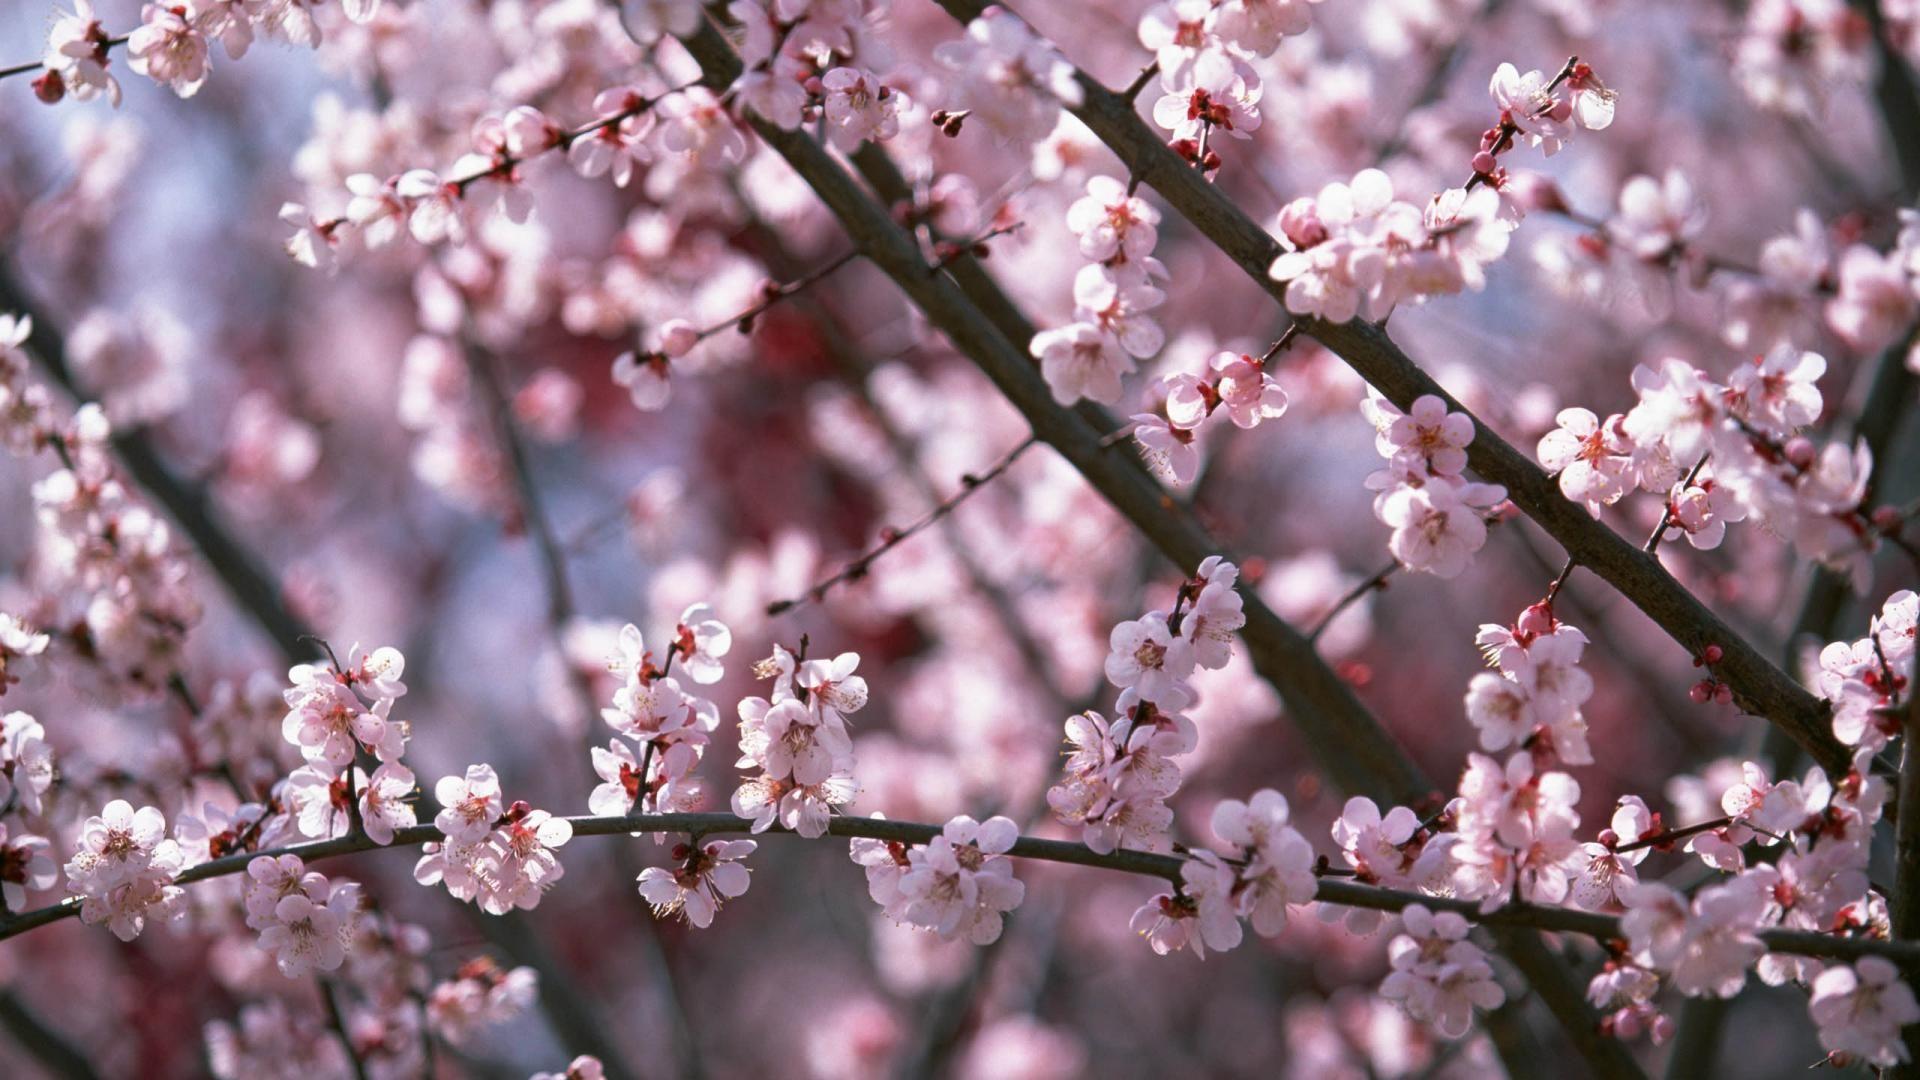 Wallpapers Sakura Hd 1920 1080 Hd Wallpapers Cherry Blossom Wallpaper Sakura Cherry Blossom Blossom Flower